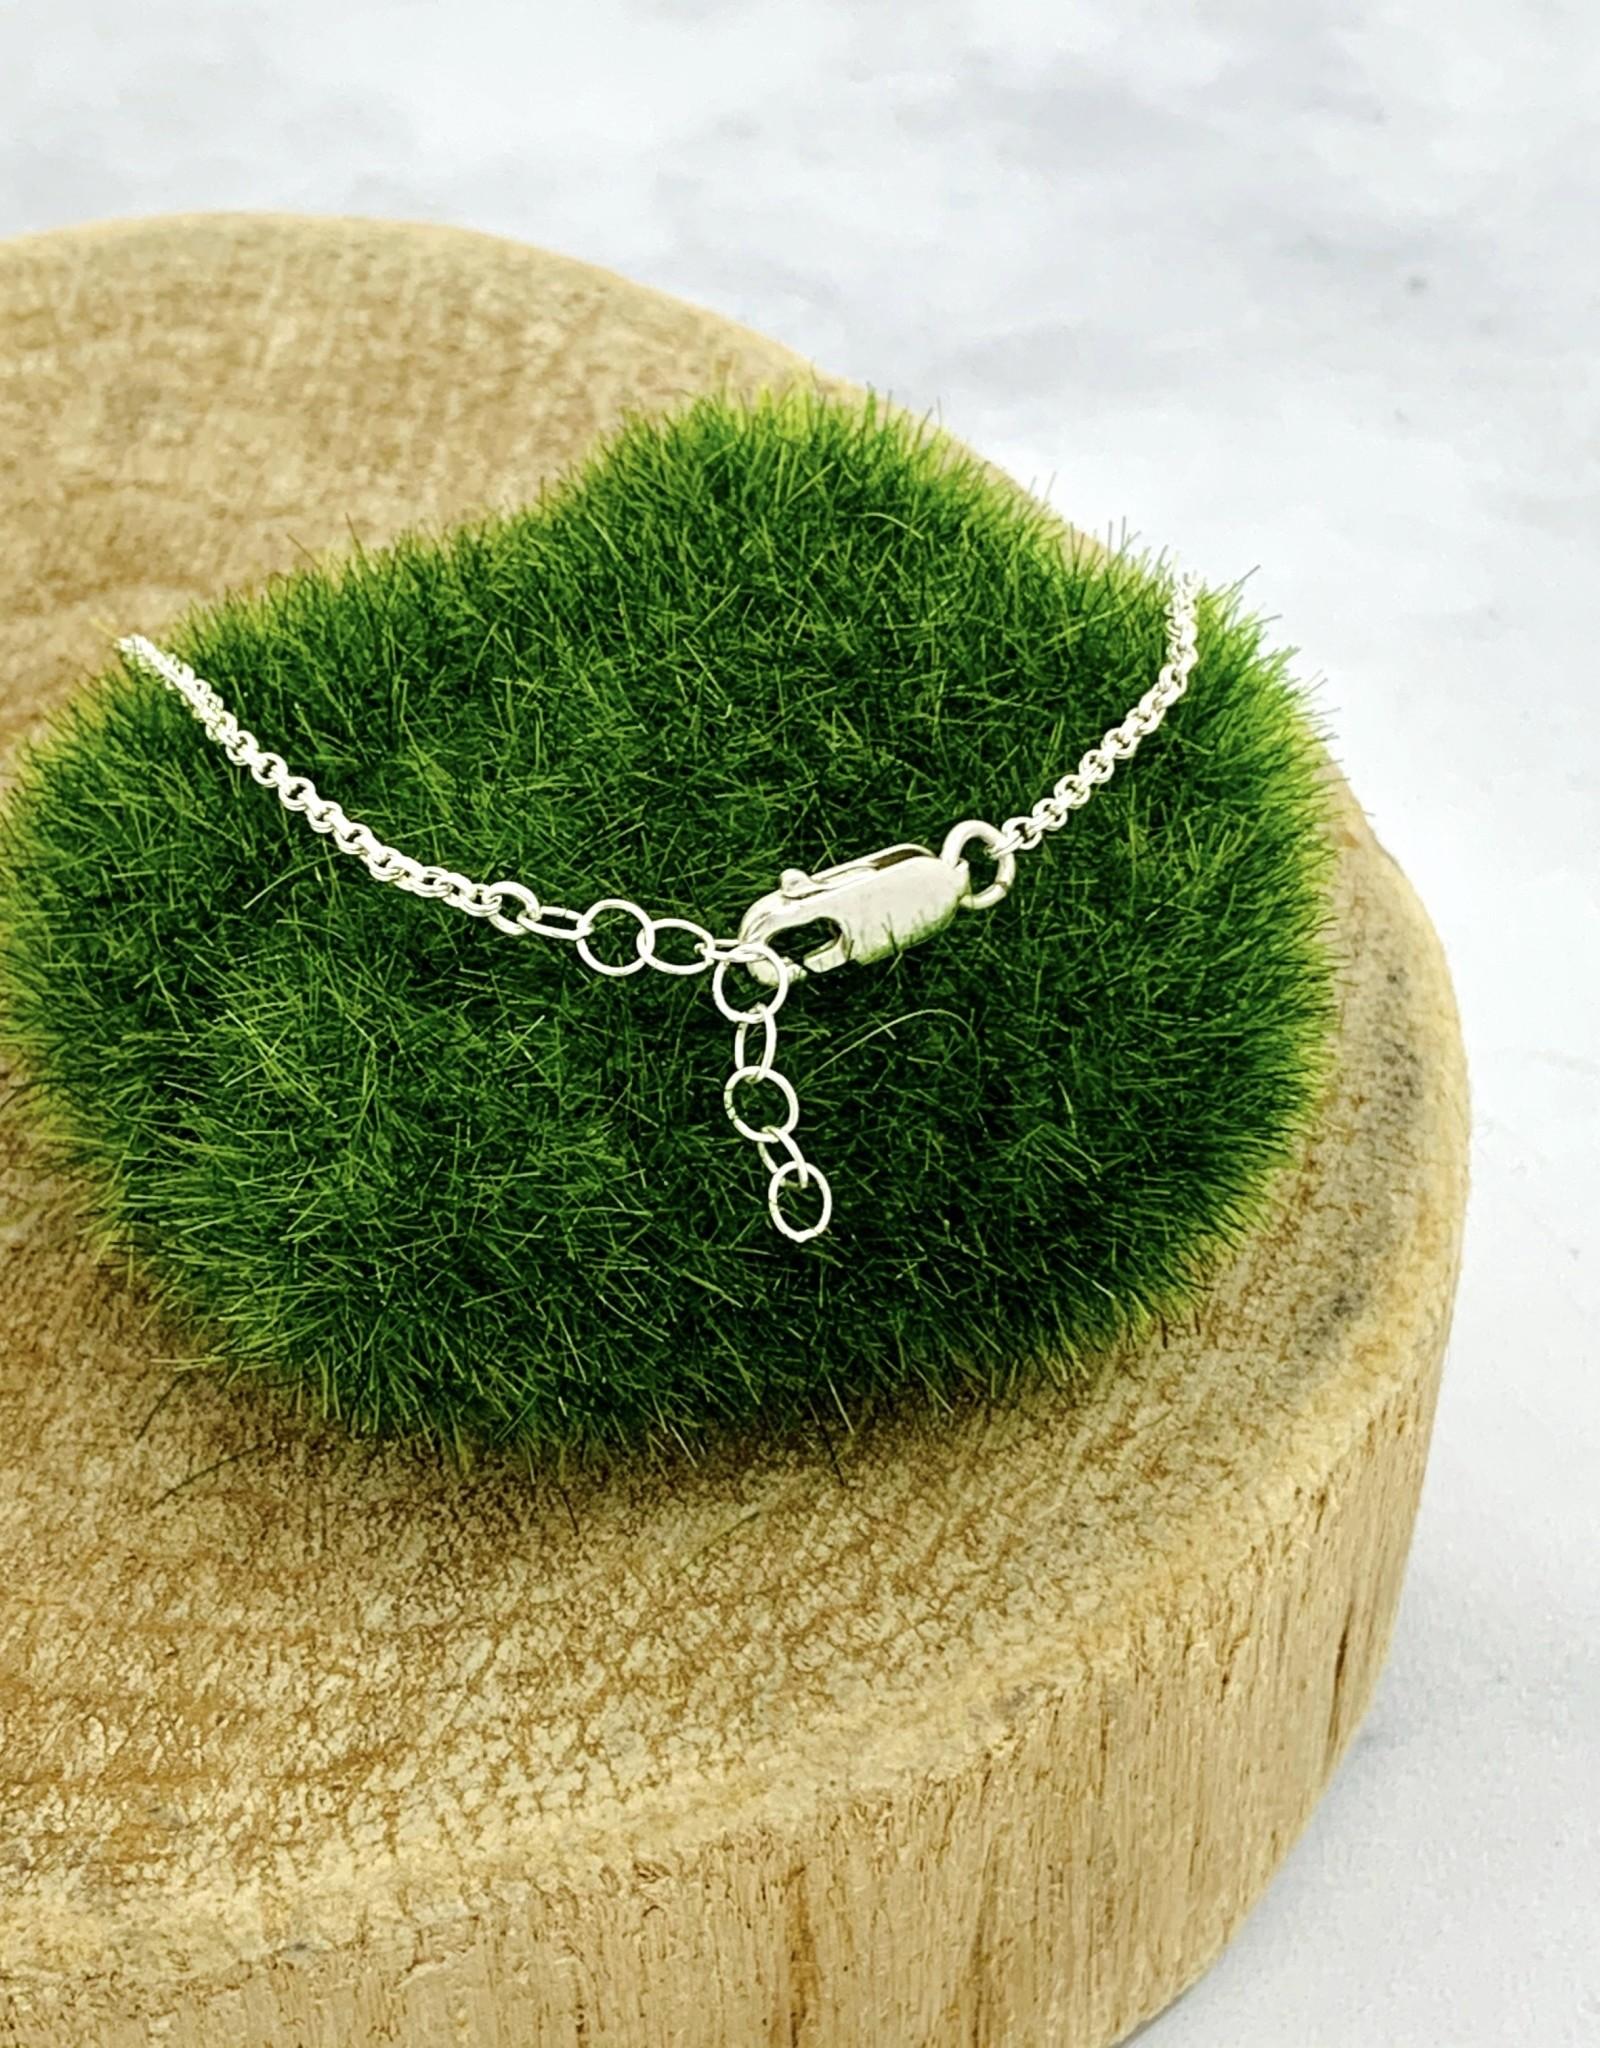 Handstamped Sterling Silver Bar and Chain Bracelet